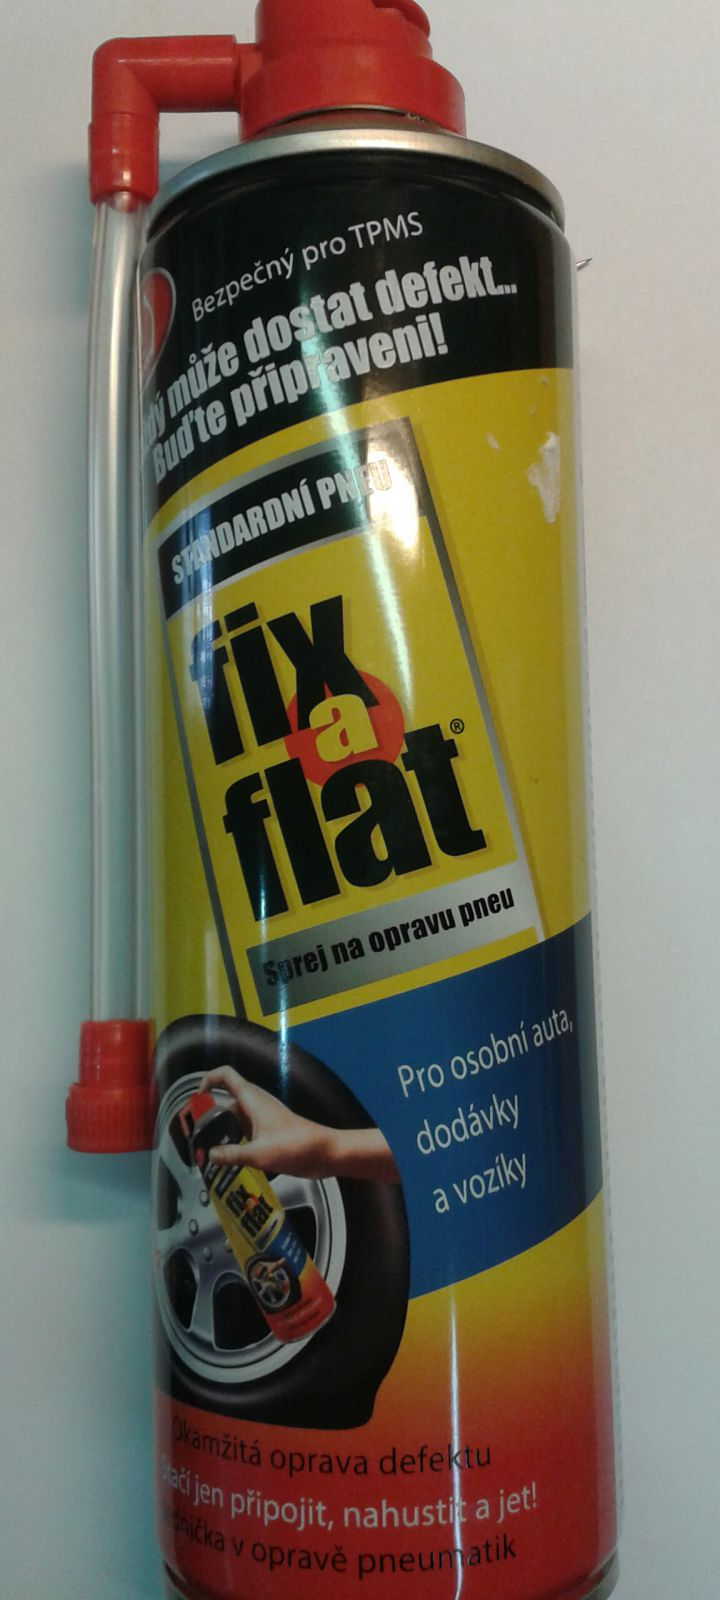 FIX A FLAT – defekt opravný sprej 0,5L Slime